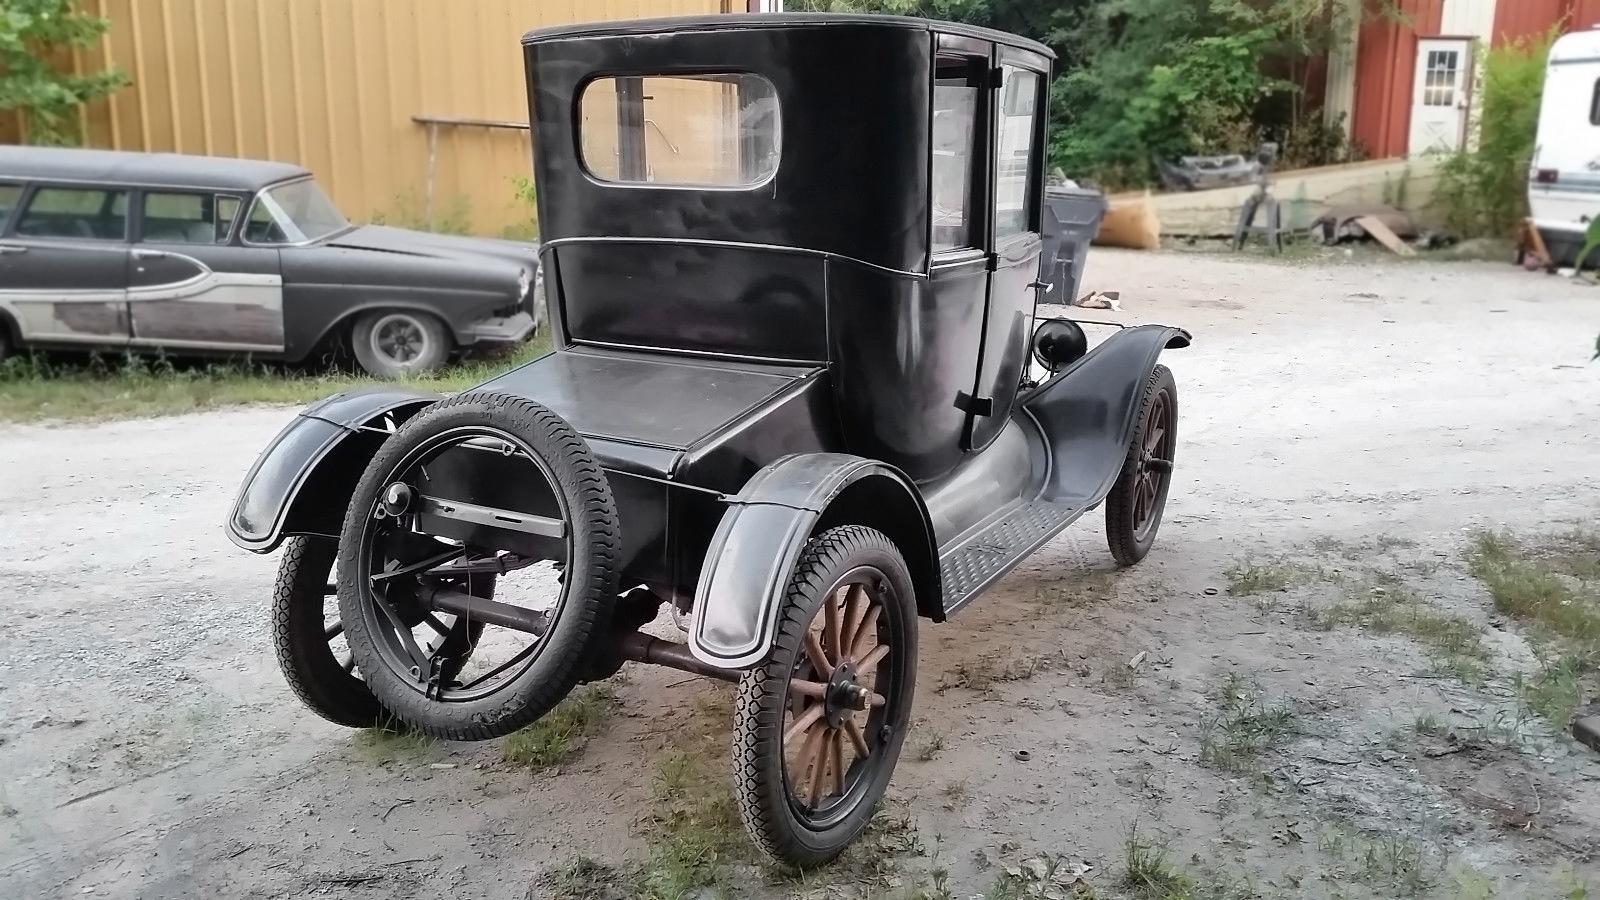 kansas coupe 1922 ford model t coupe. Black Bedroom Furniture Sets. Home Design Ideas